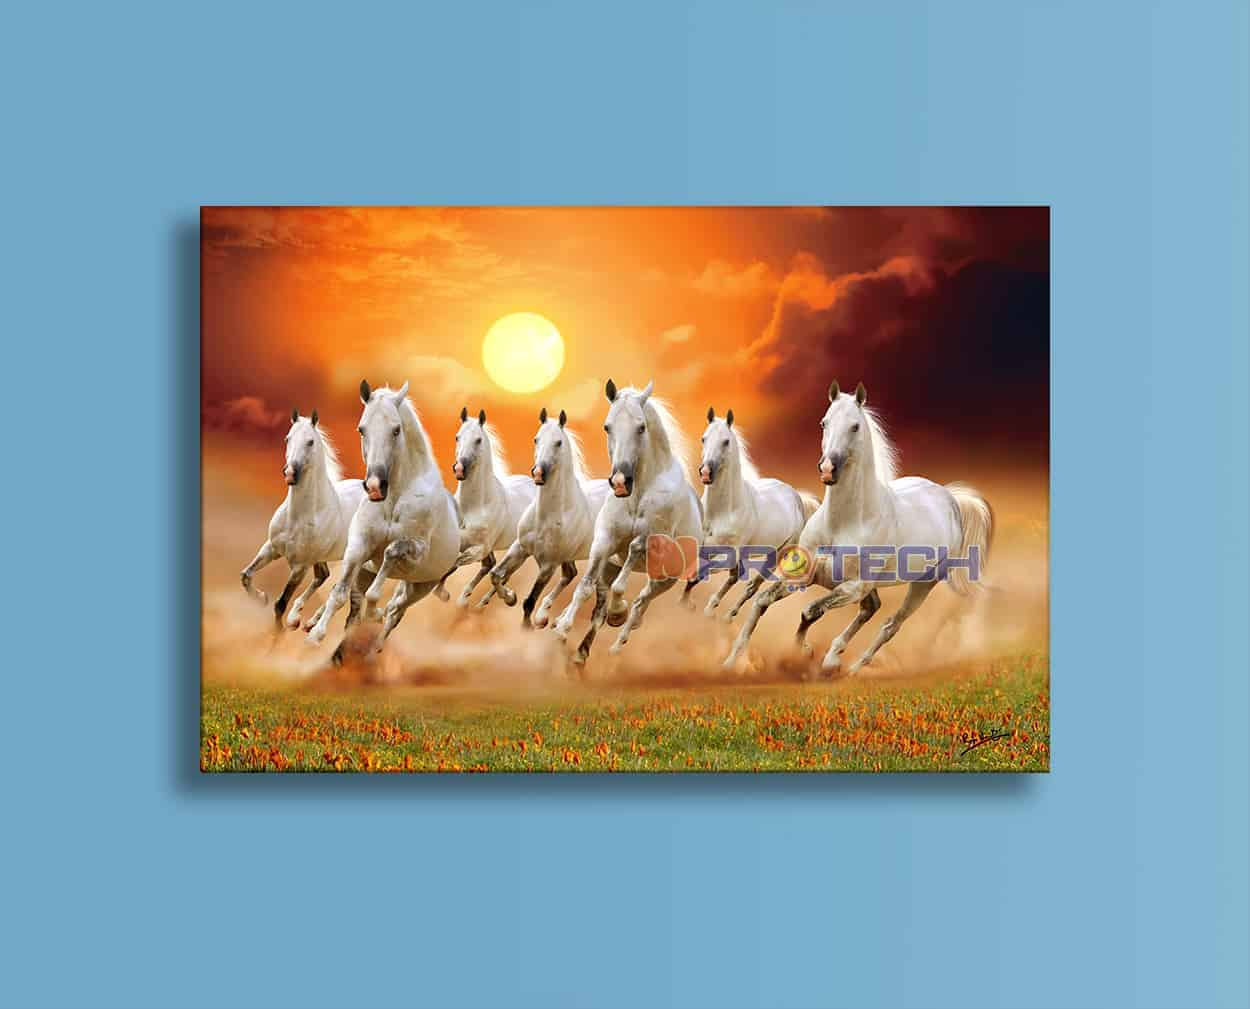 Seven Horses Running Painting 1250x1009 Wallpaper Teahub Io